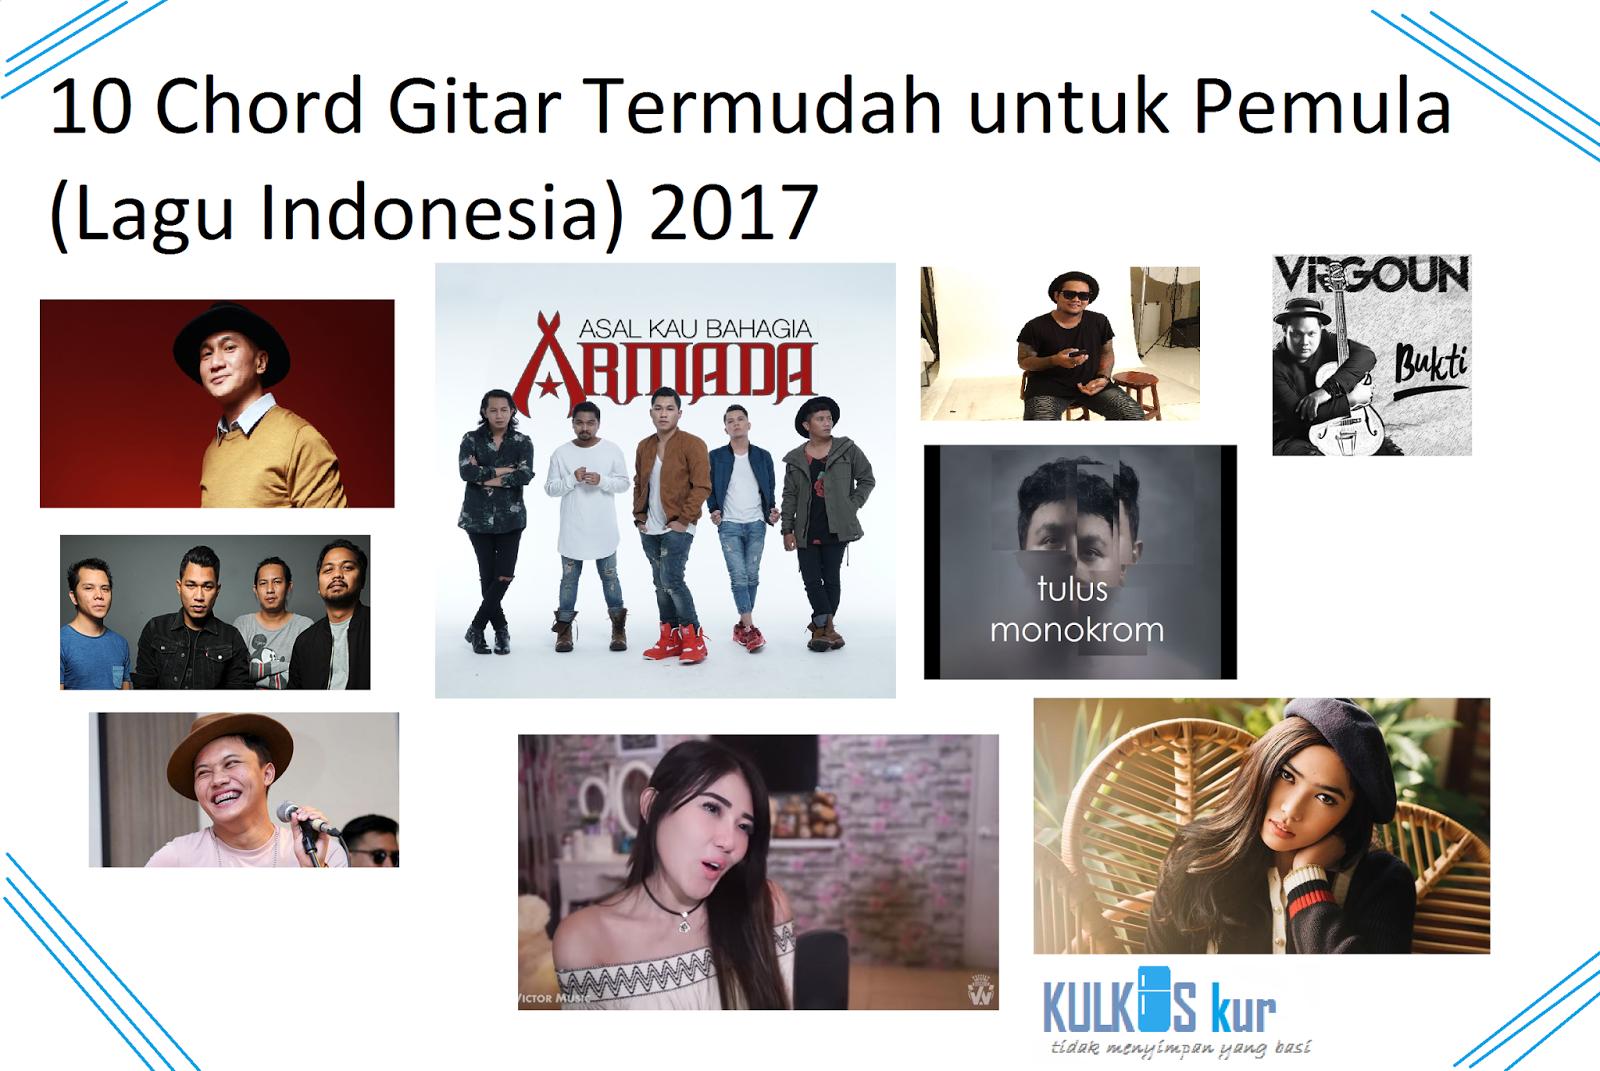 10 Lagu Indonesia Dengan Chord Gitar Termudah Part 3 2017 Bukan Menggurui